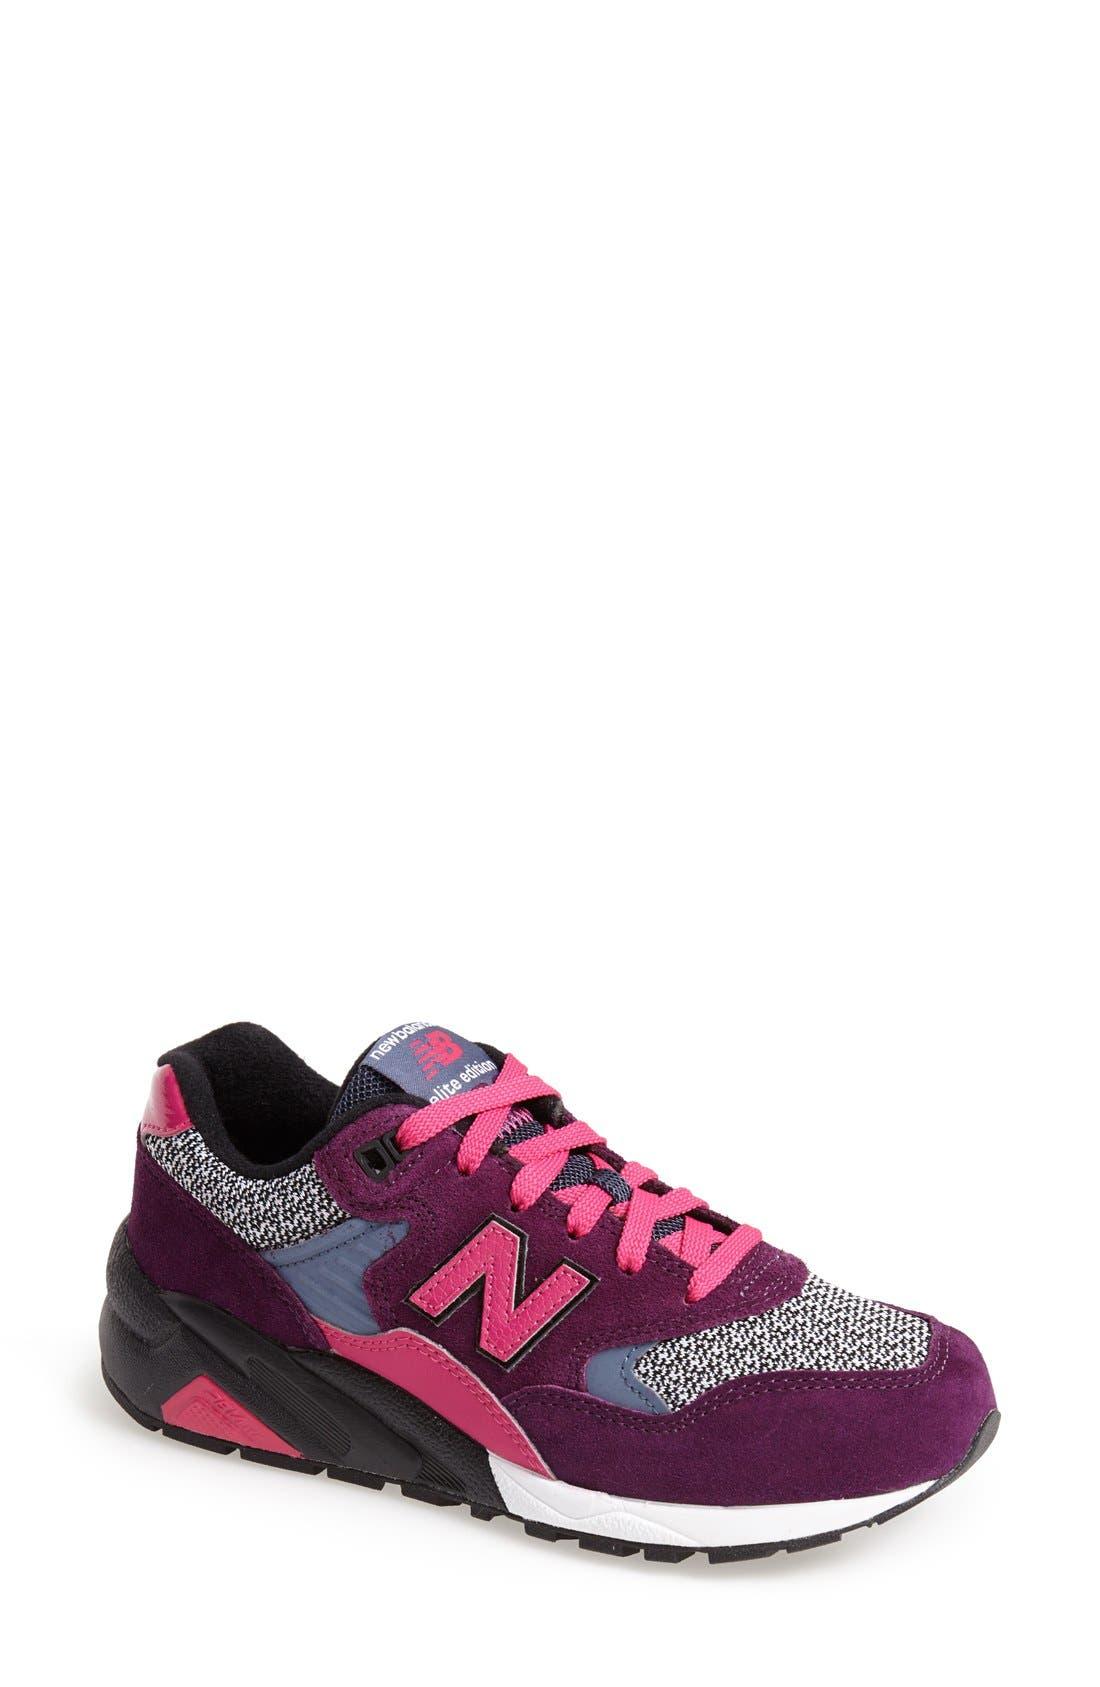 Main Image - New Balance '580' Sneaker (Women)